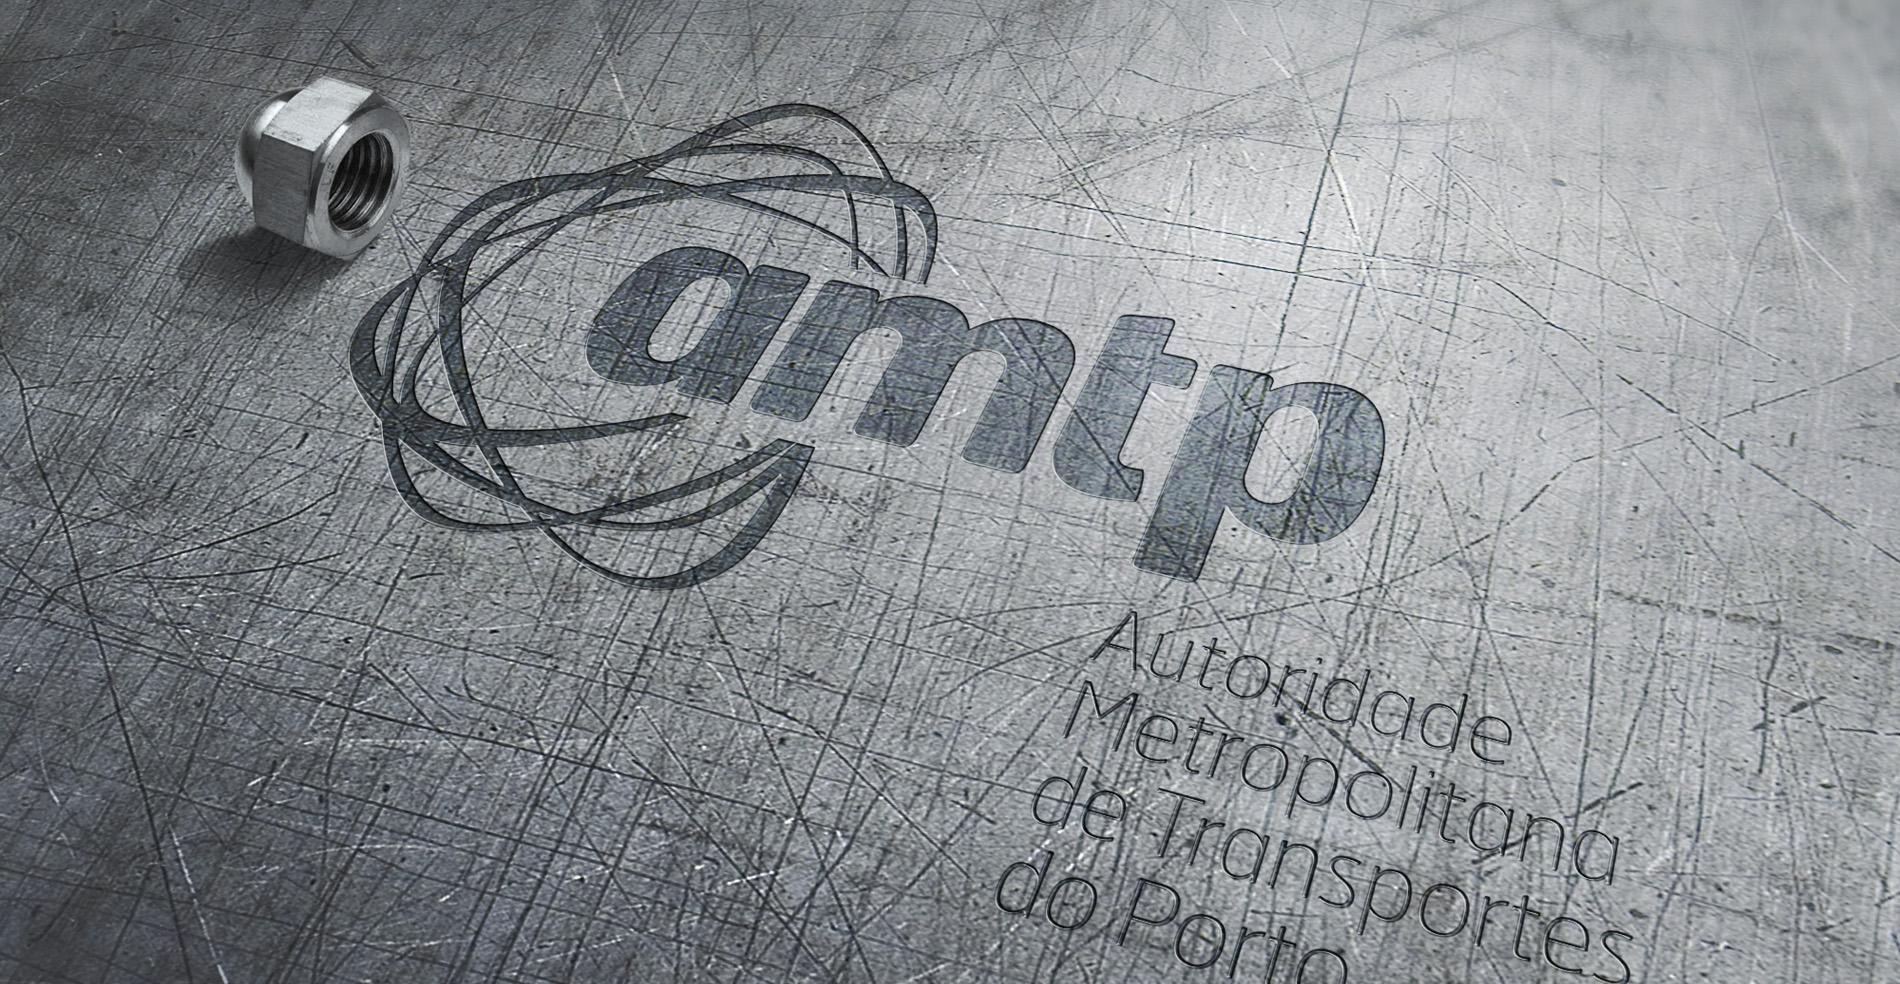 AMTP_02